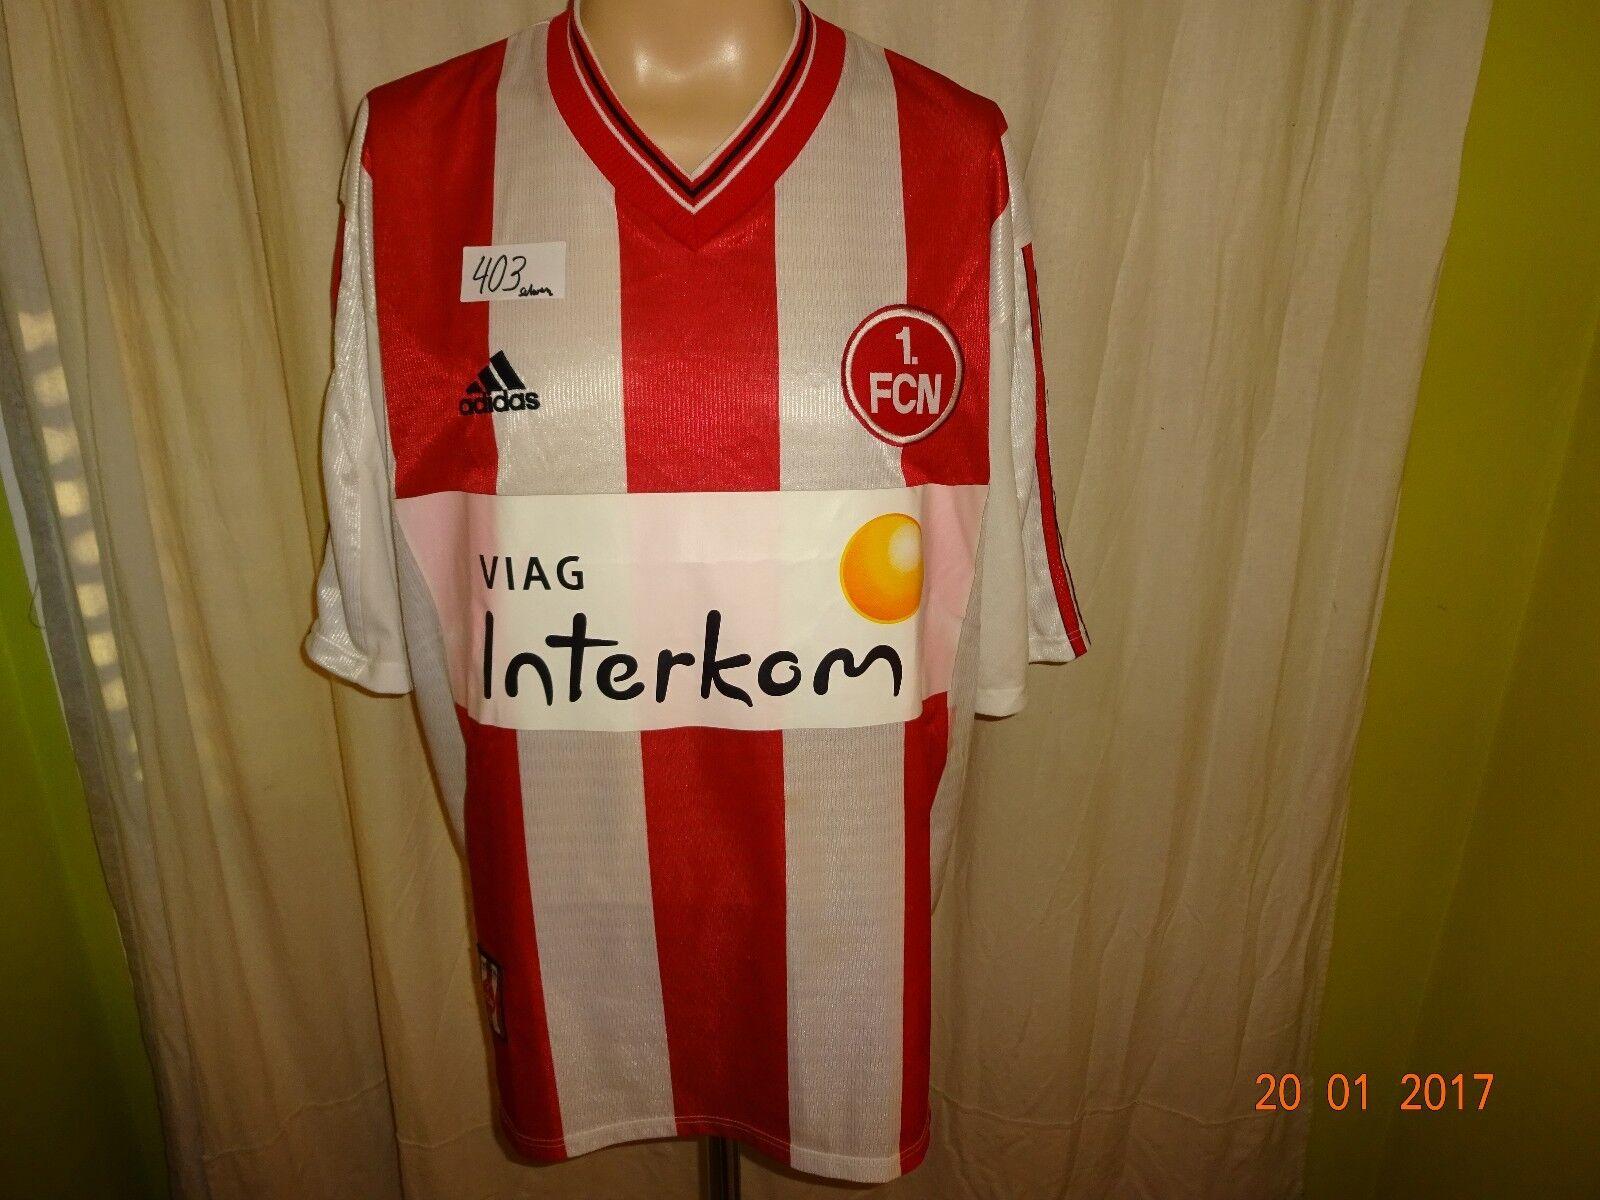 1.FC Nürnberg Original Original Original Adidas Heim Trikot 1998 99  Viag Interkom  Gr.XL- XXL 3475dc